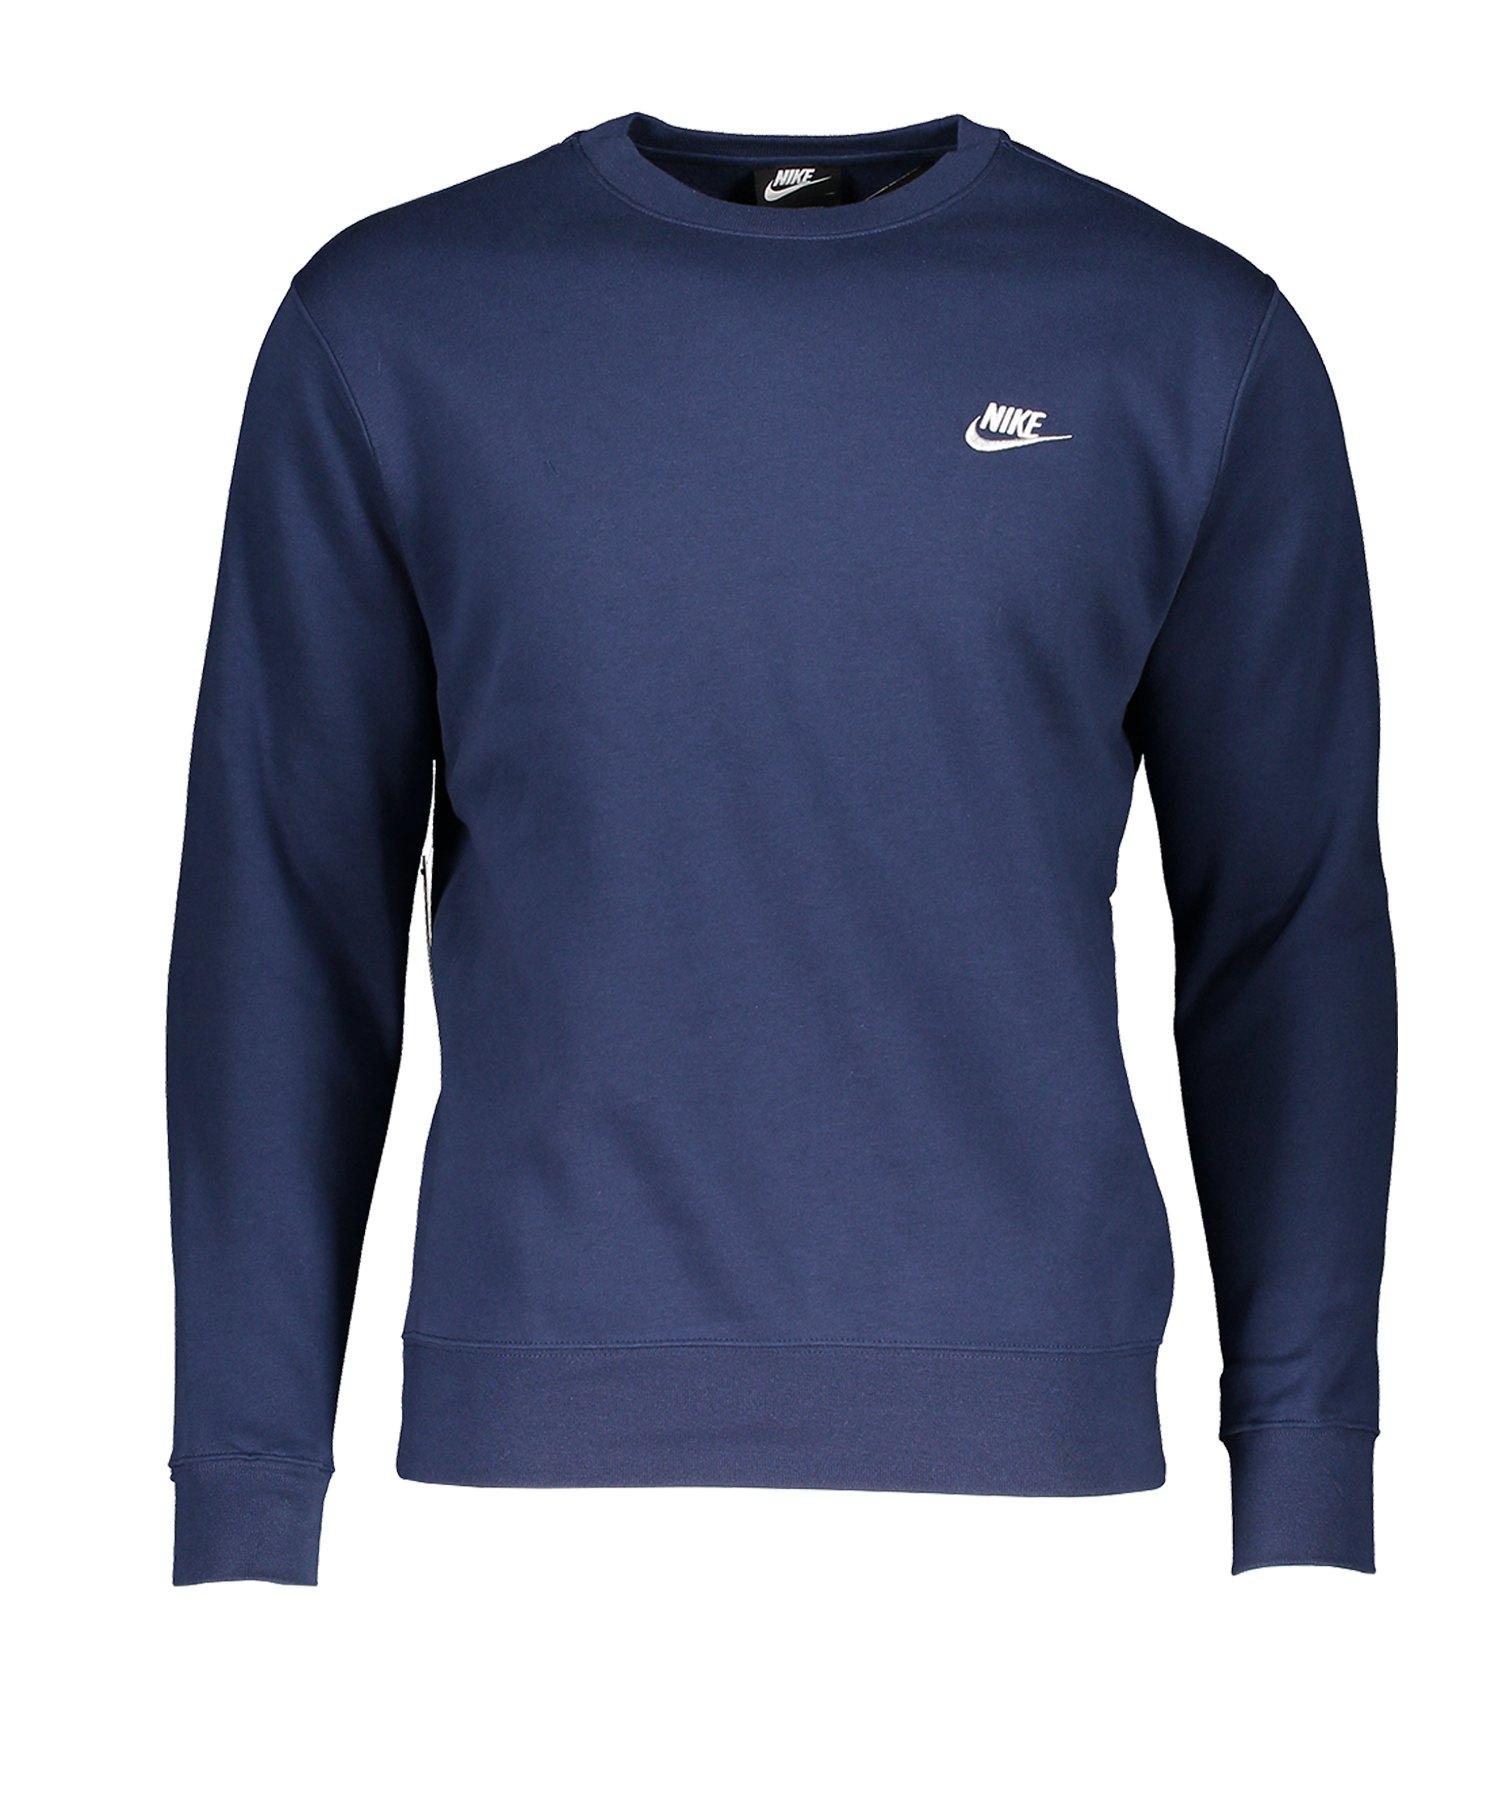 Nike Club Crew Sweatshirt Blau F410 - Blau